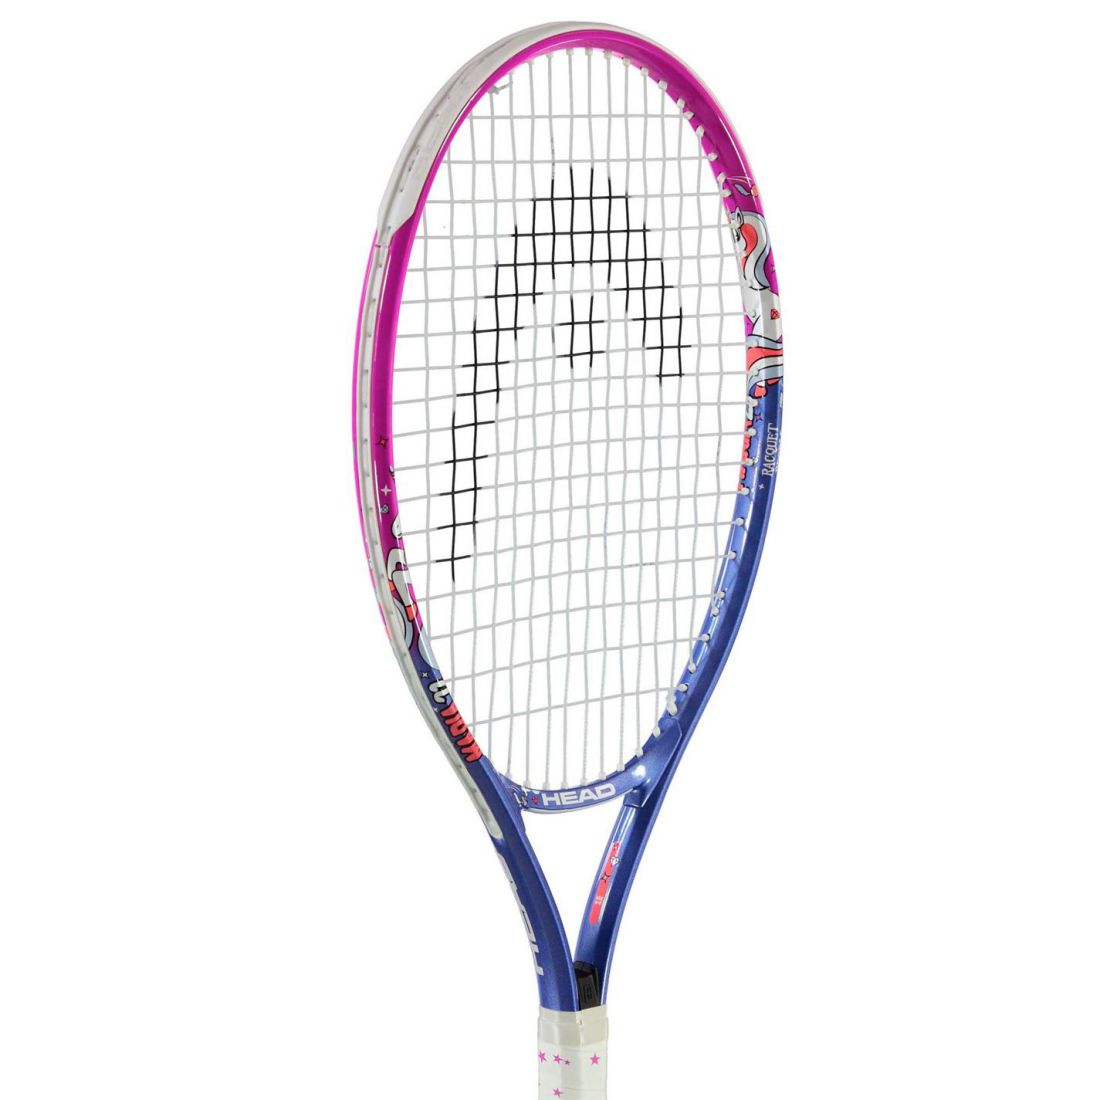 Slazenger Storm Set Youngster Childrens Tennis Racket